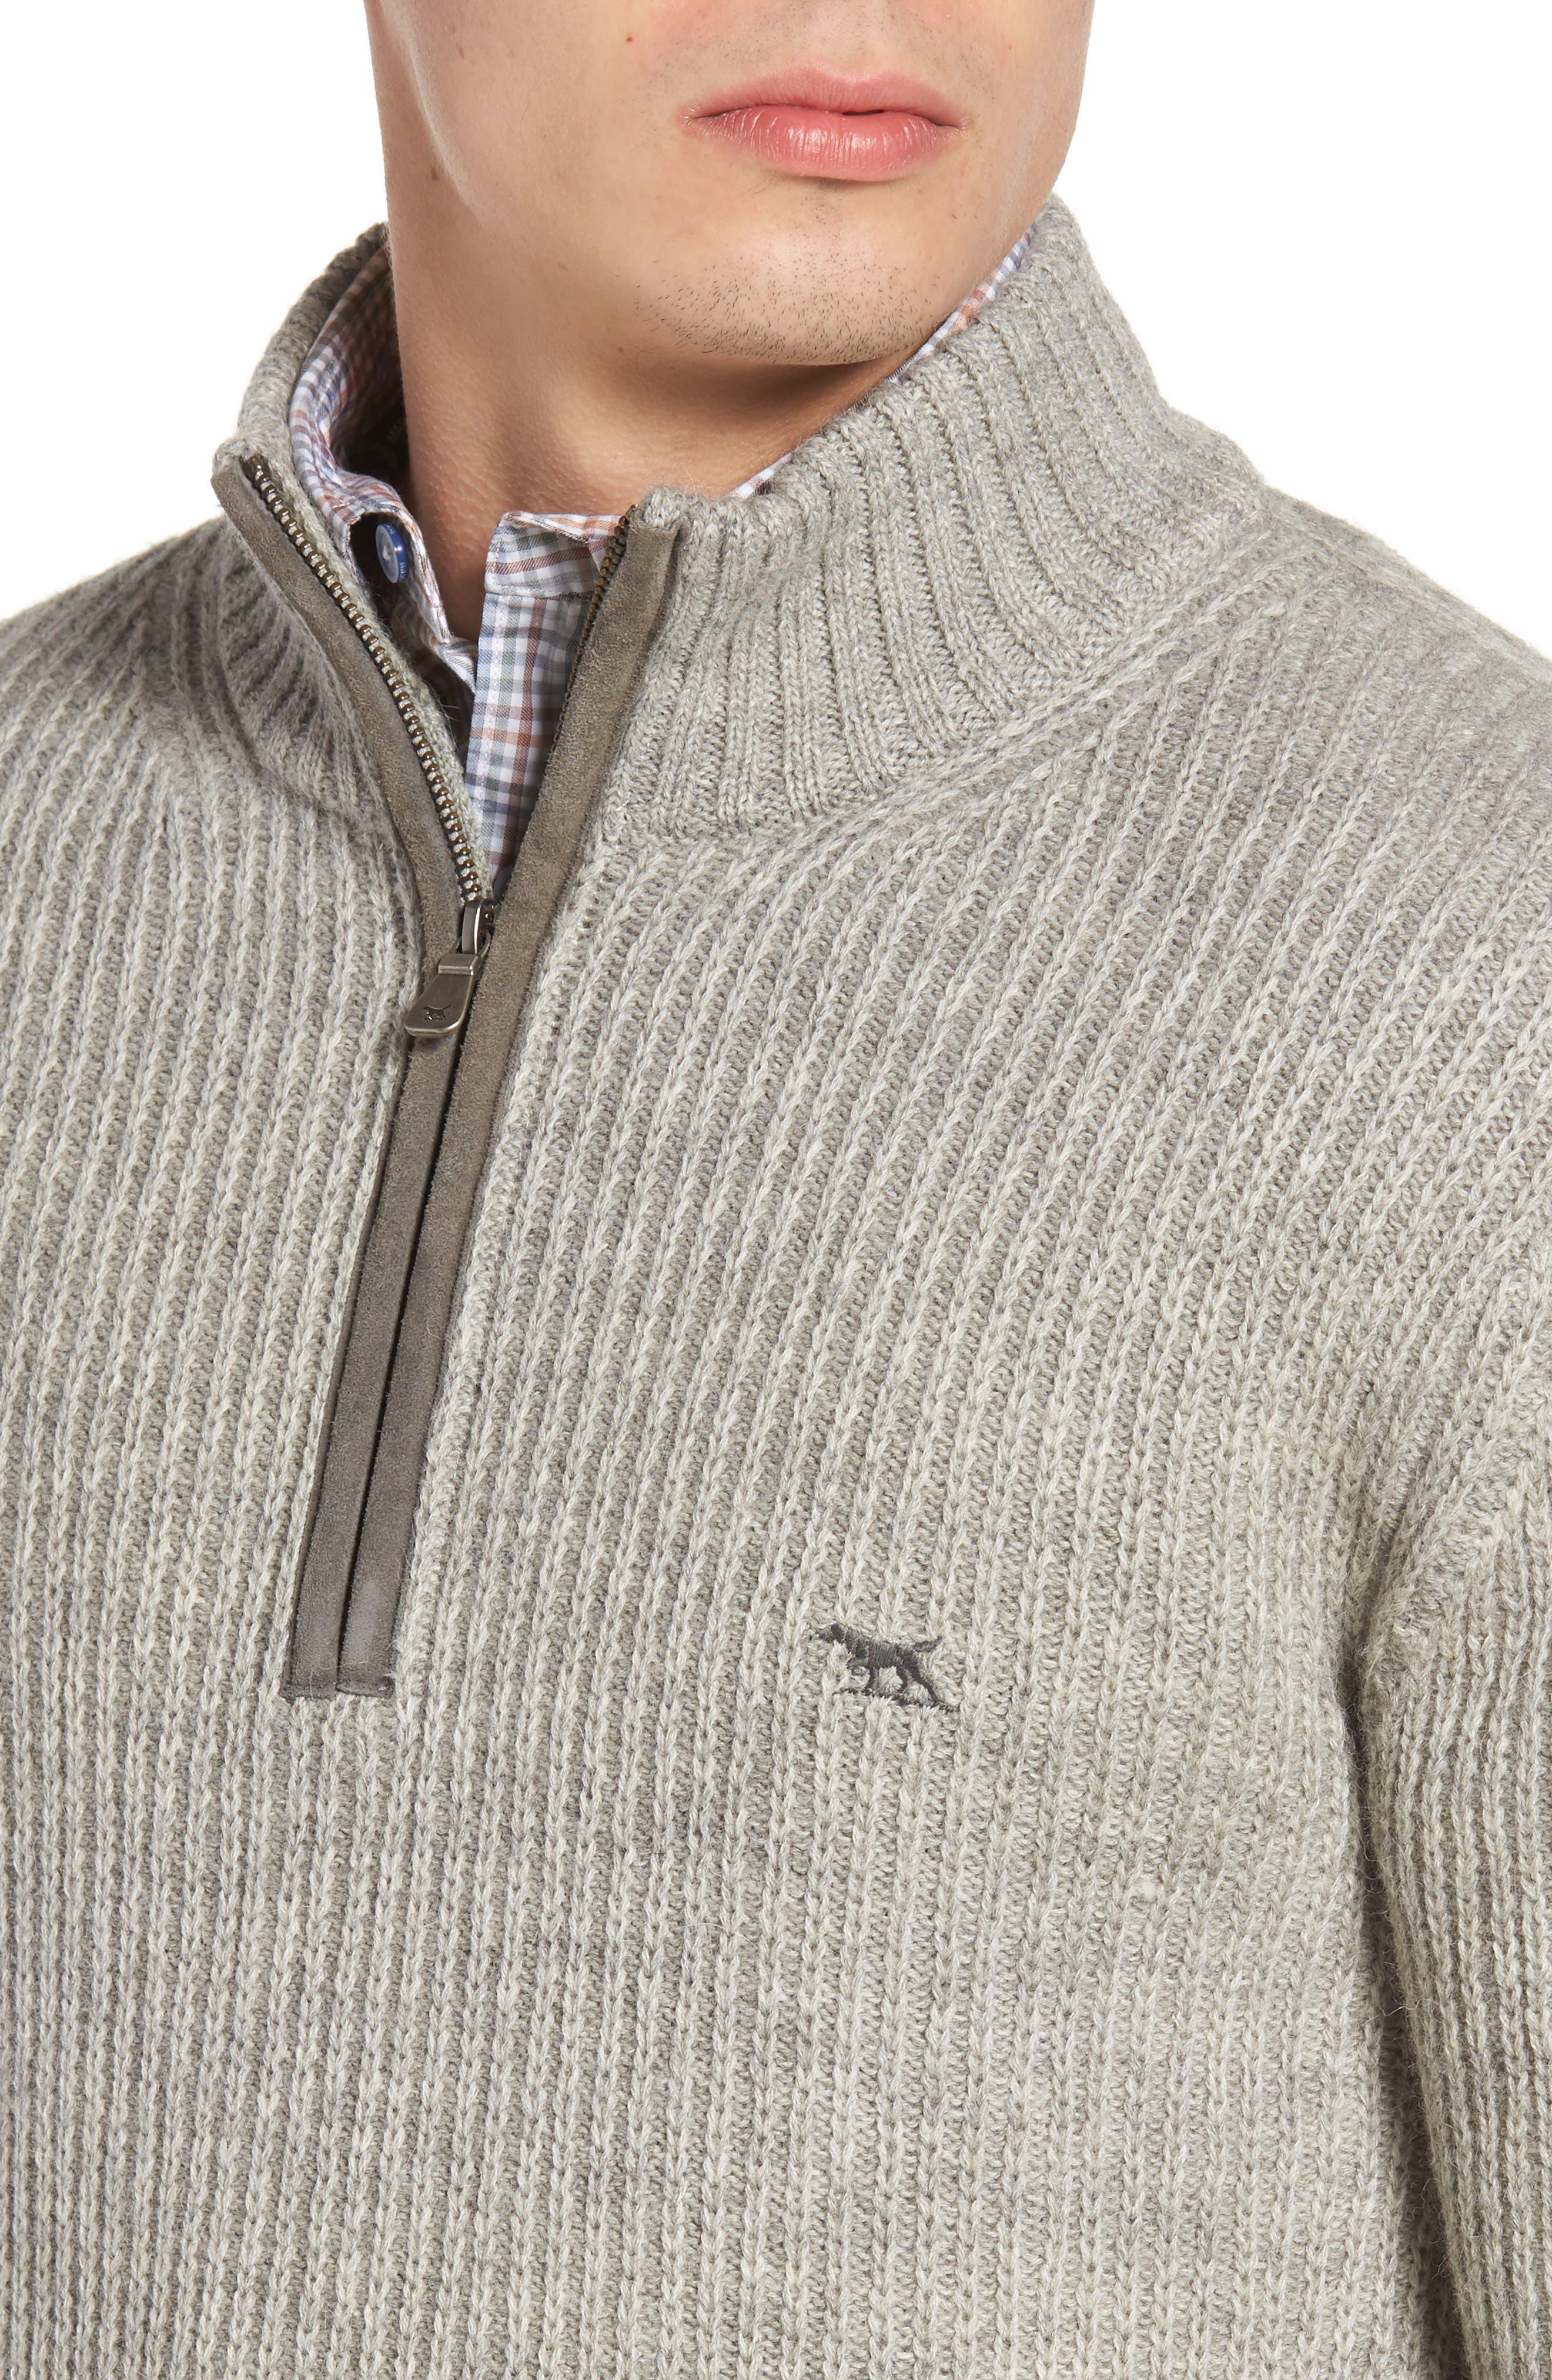 'Huka Lodge' Merino Wool Blend Quarter Zip Sweater,                             Alternate thumbnail 4, color,                             268